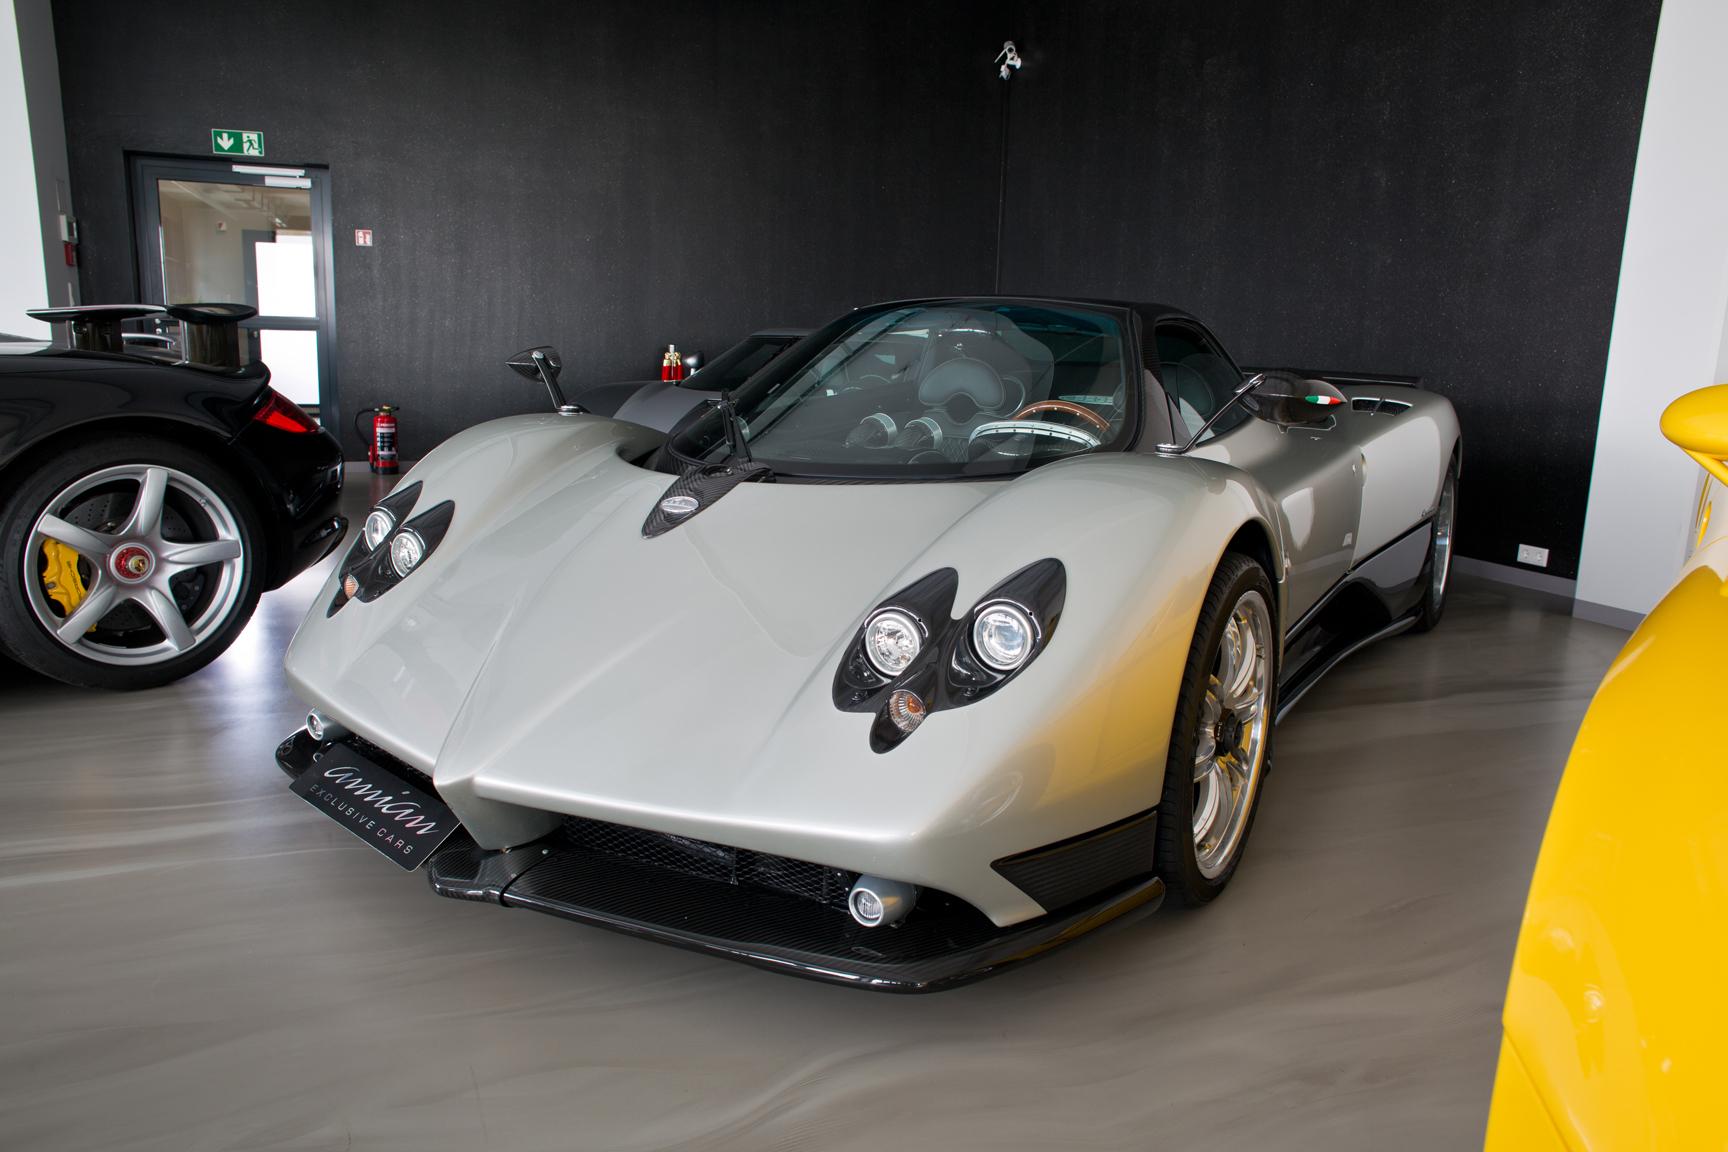 Stunning Silver Pagani Zonda F For Sale - GTspirit